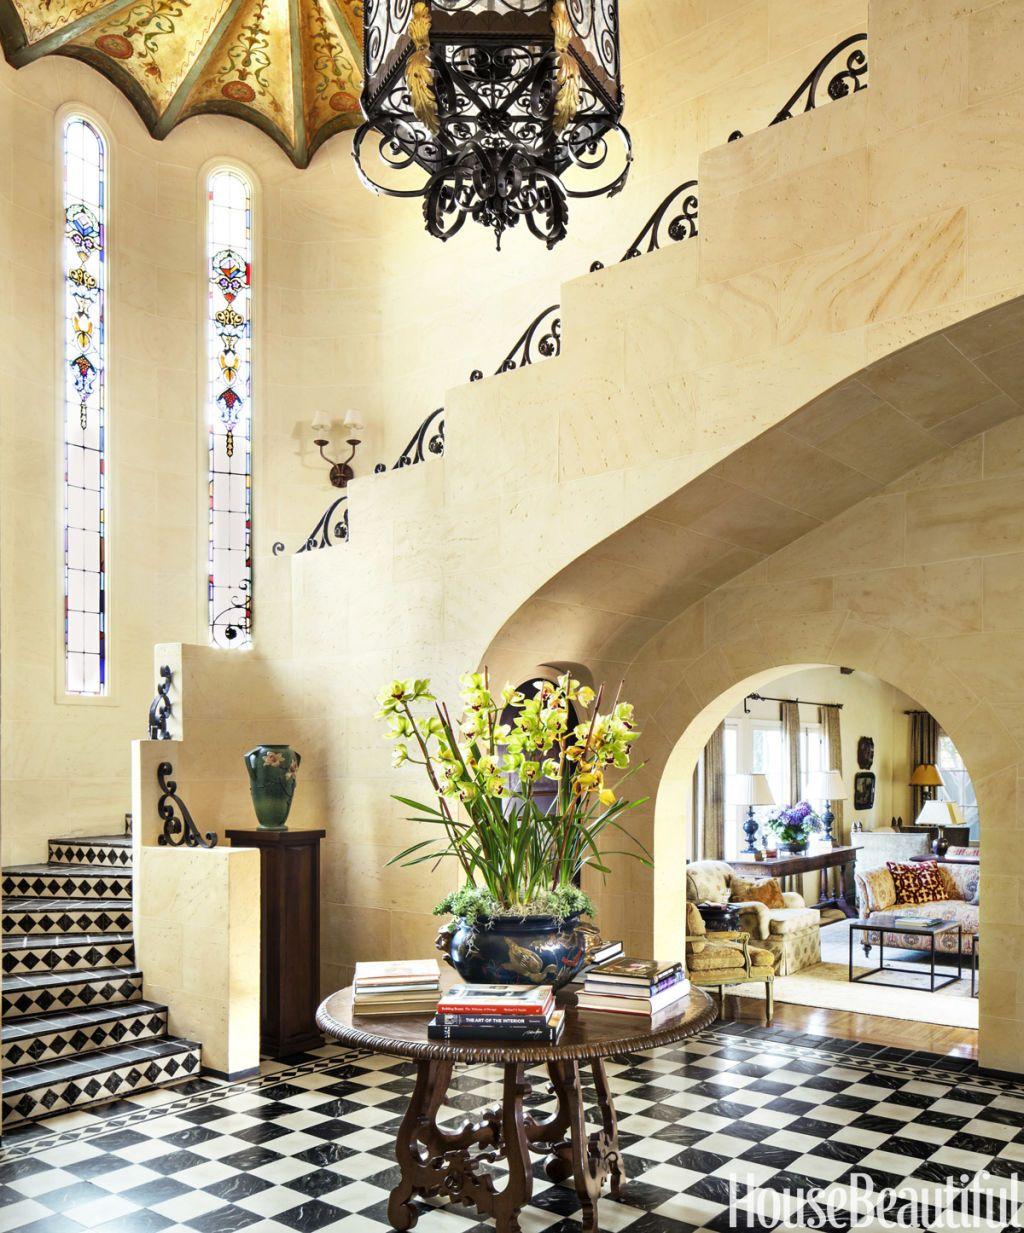 1920s spanish colonial revival houseimage lisa romerein entry interior designer